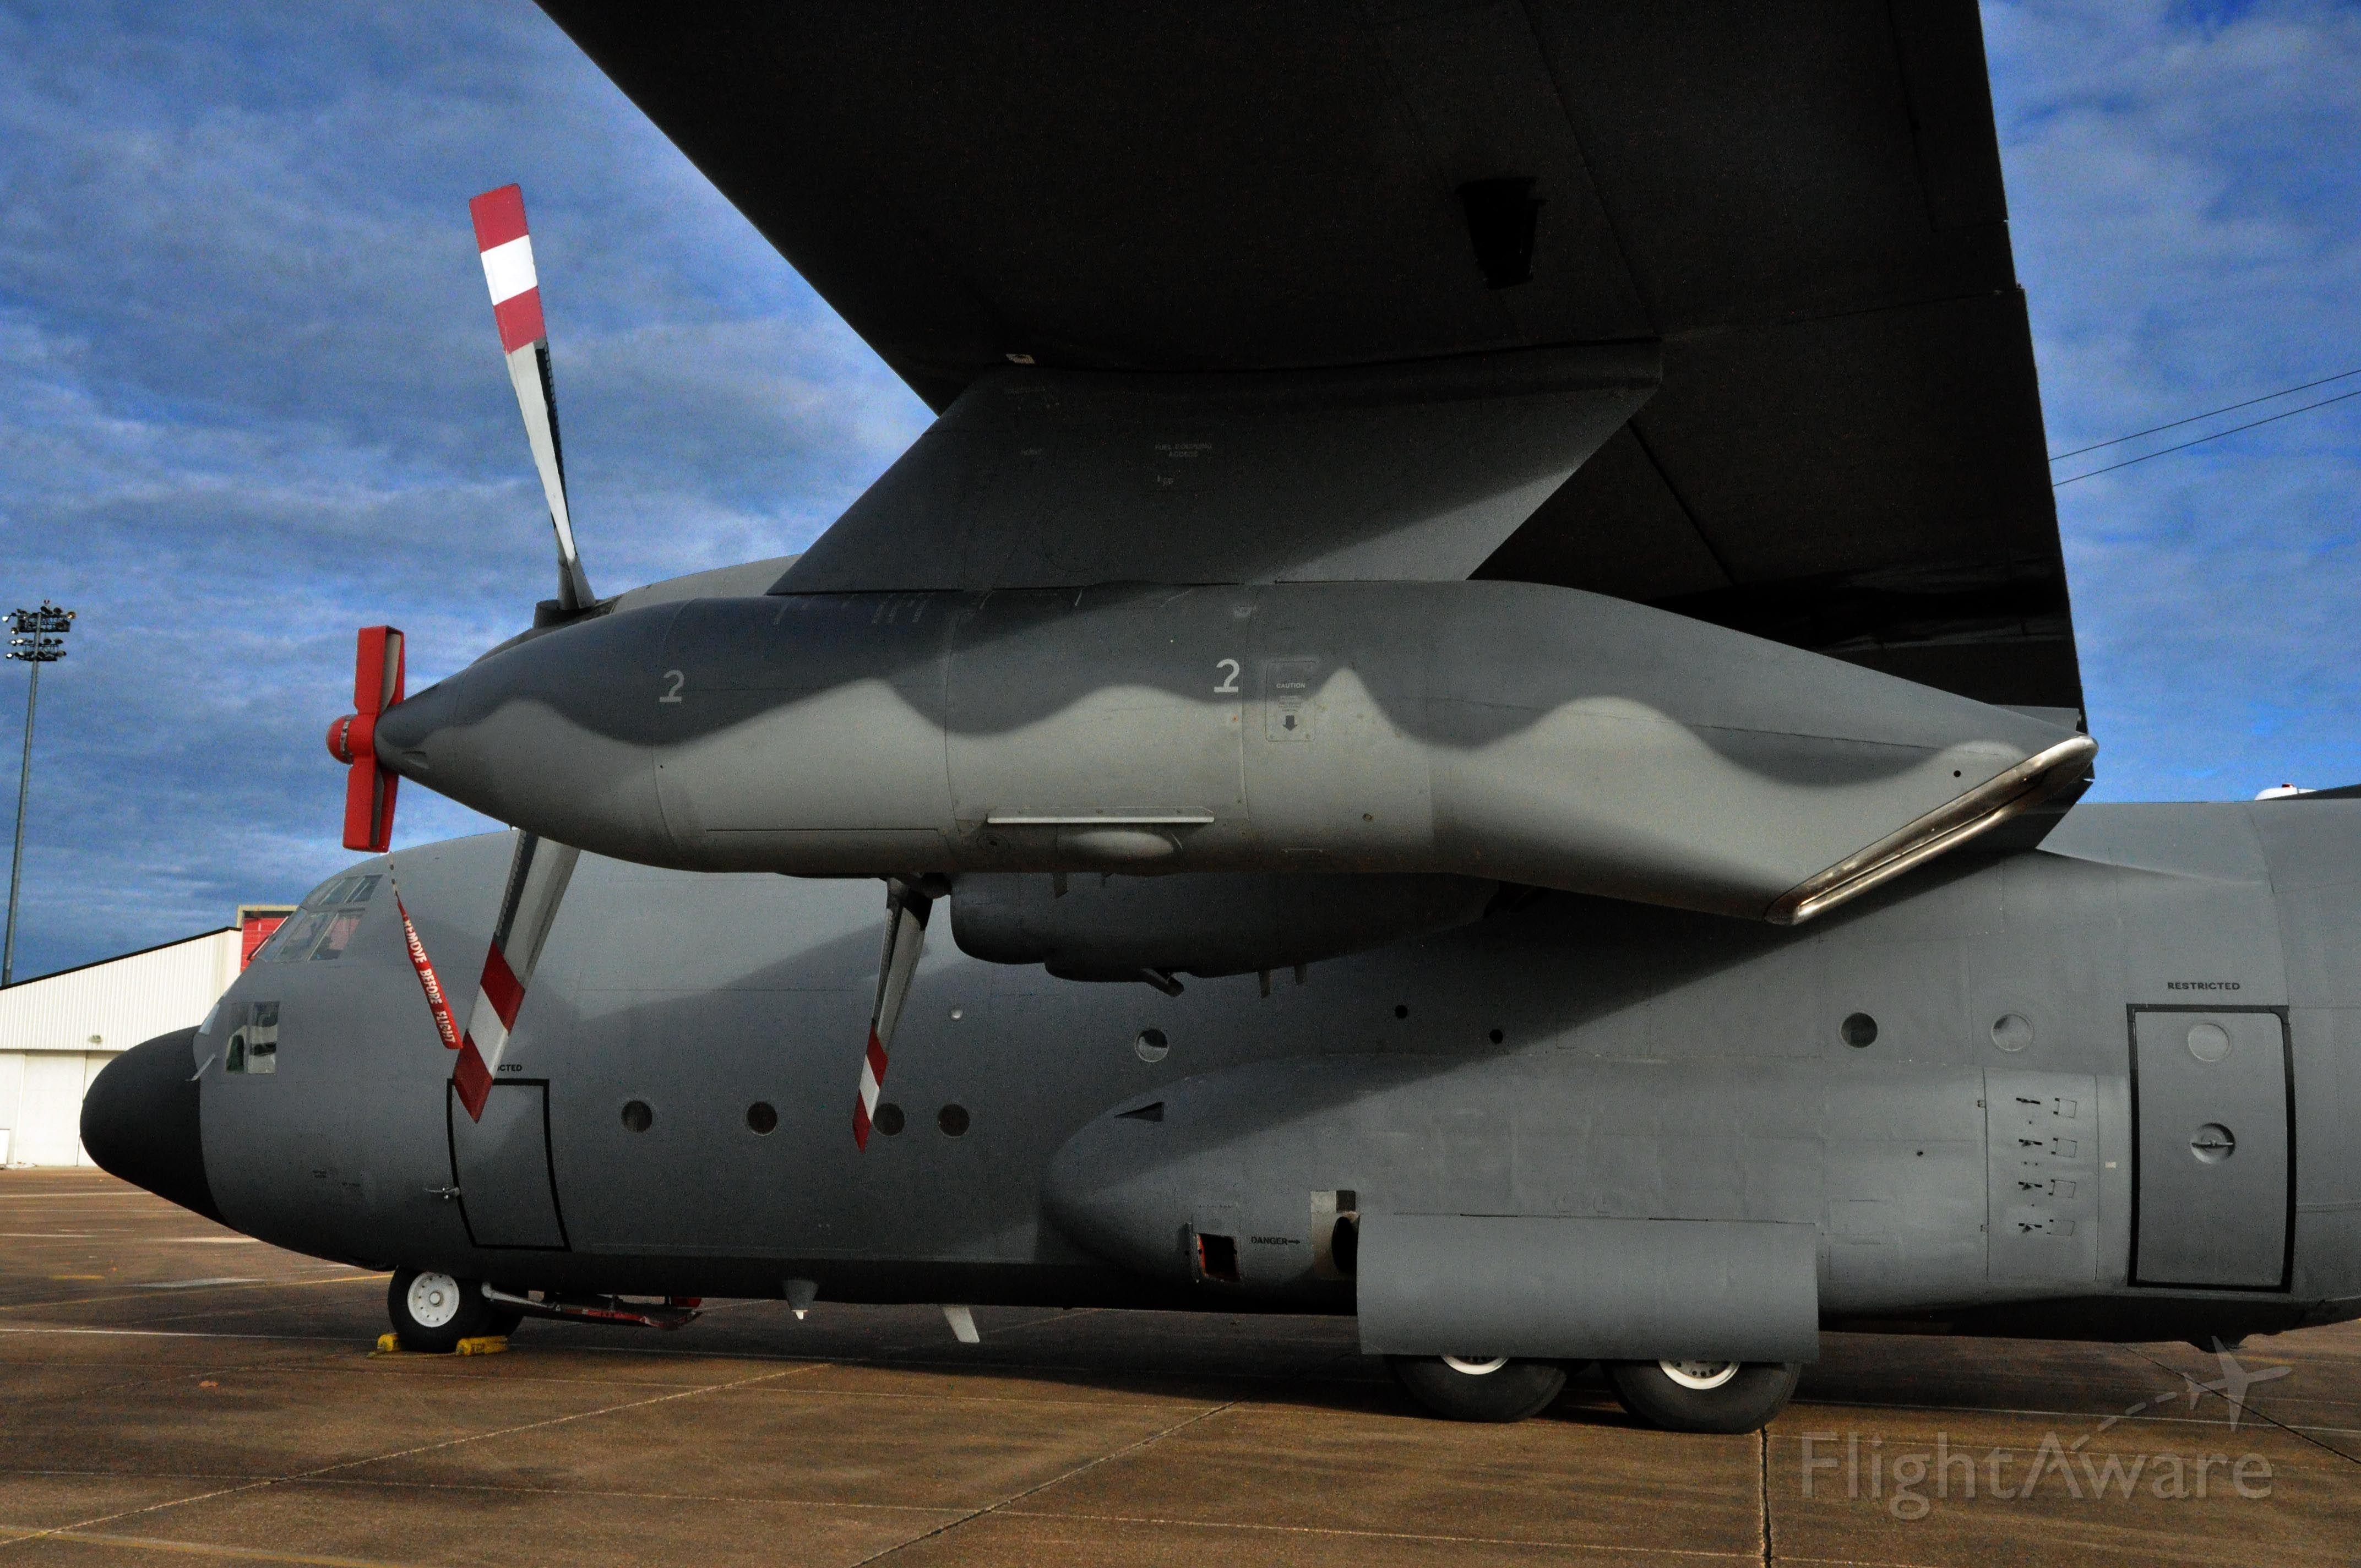 Lockheed C-130 Hercules (N131EC) - C-130A with refueling pod.